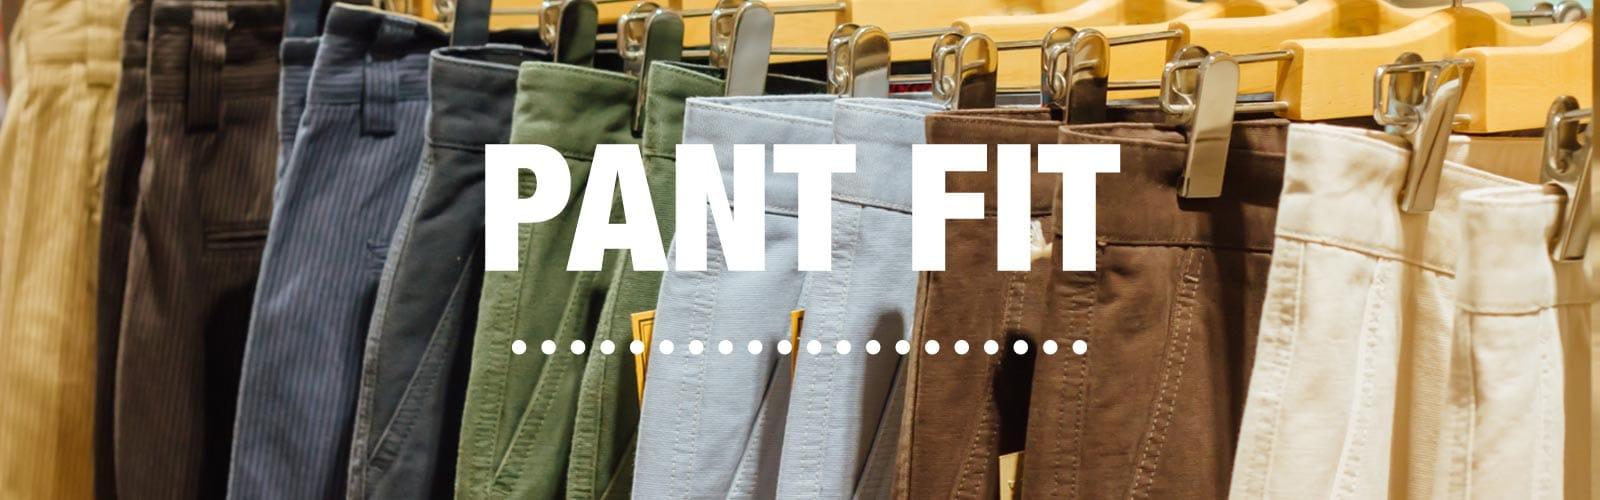 Pants Guide